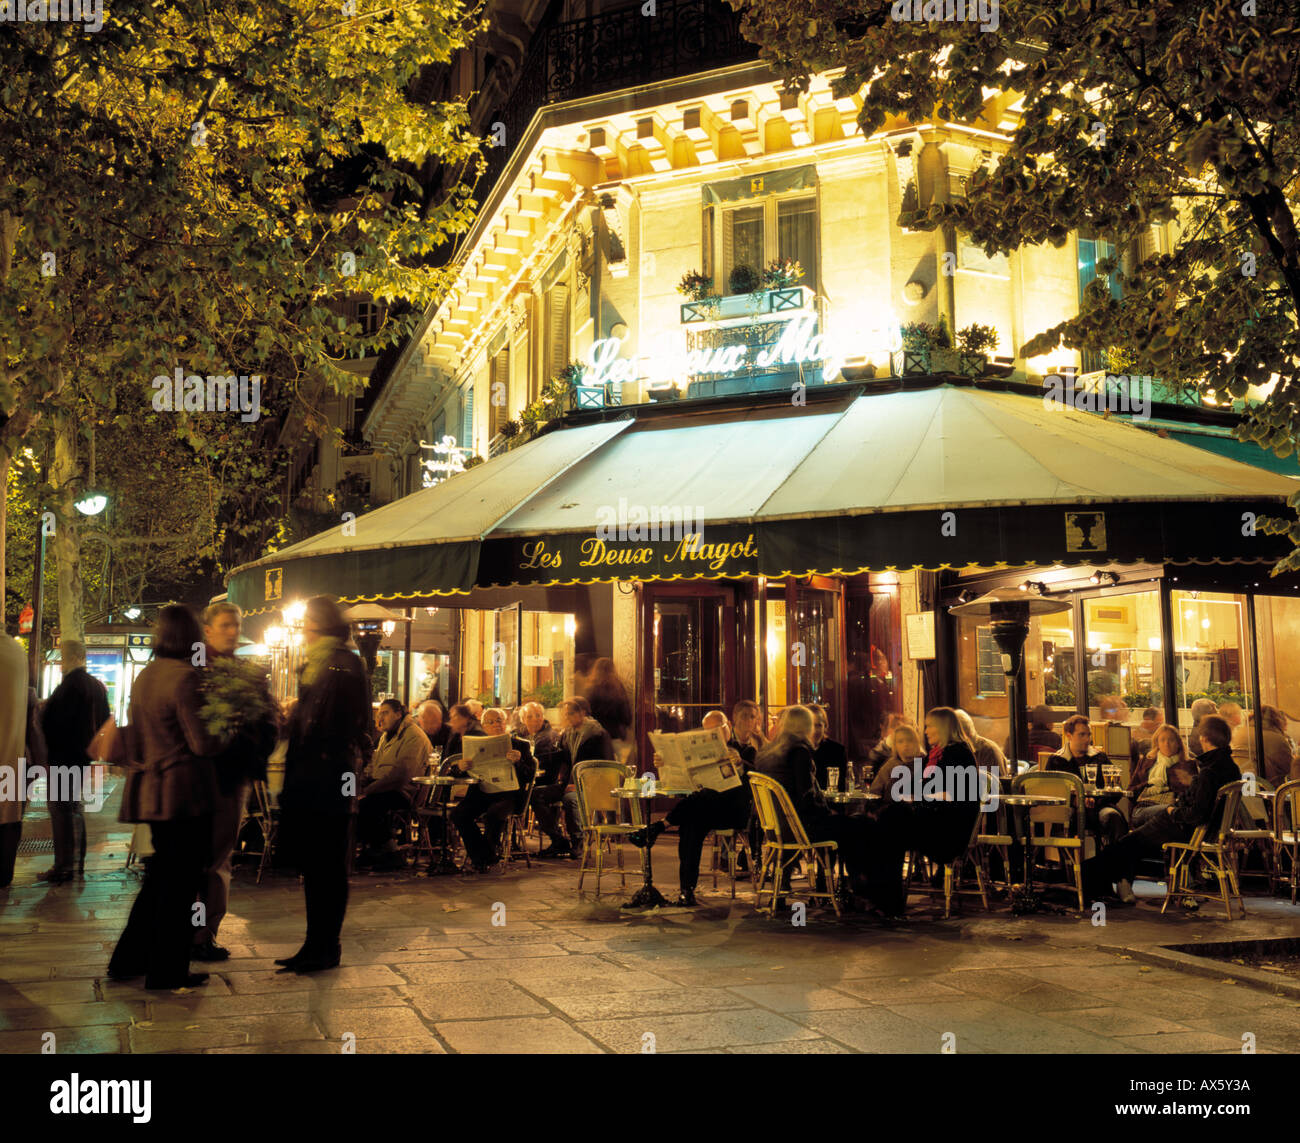 france paris st germain des pres cafe les deux magots boulevard stock photo royalty free image. Black Bedroom Furniture Sets. Home Design Ideas